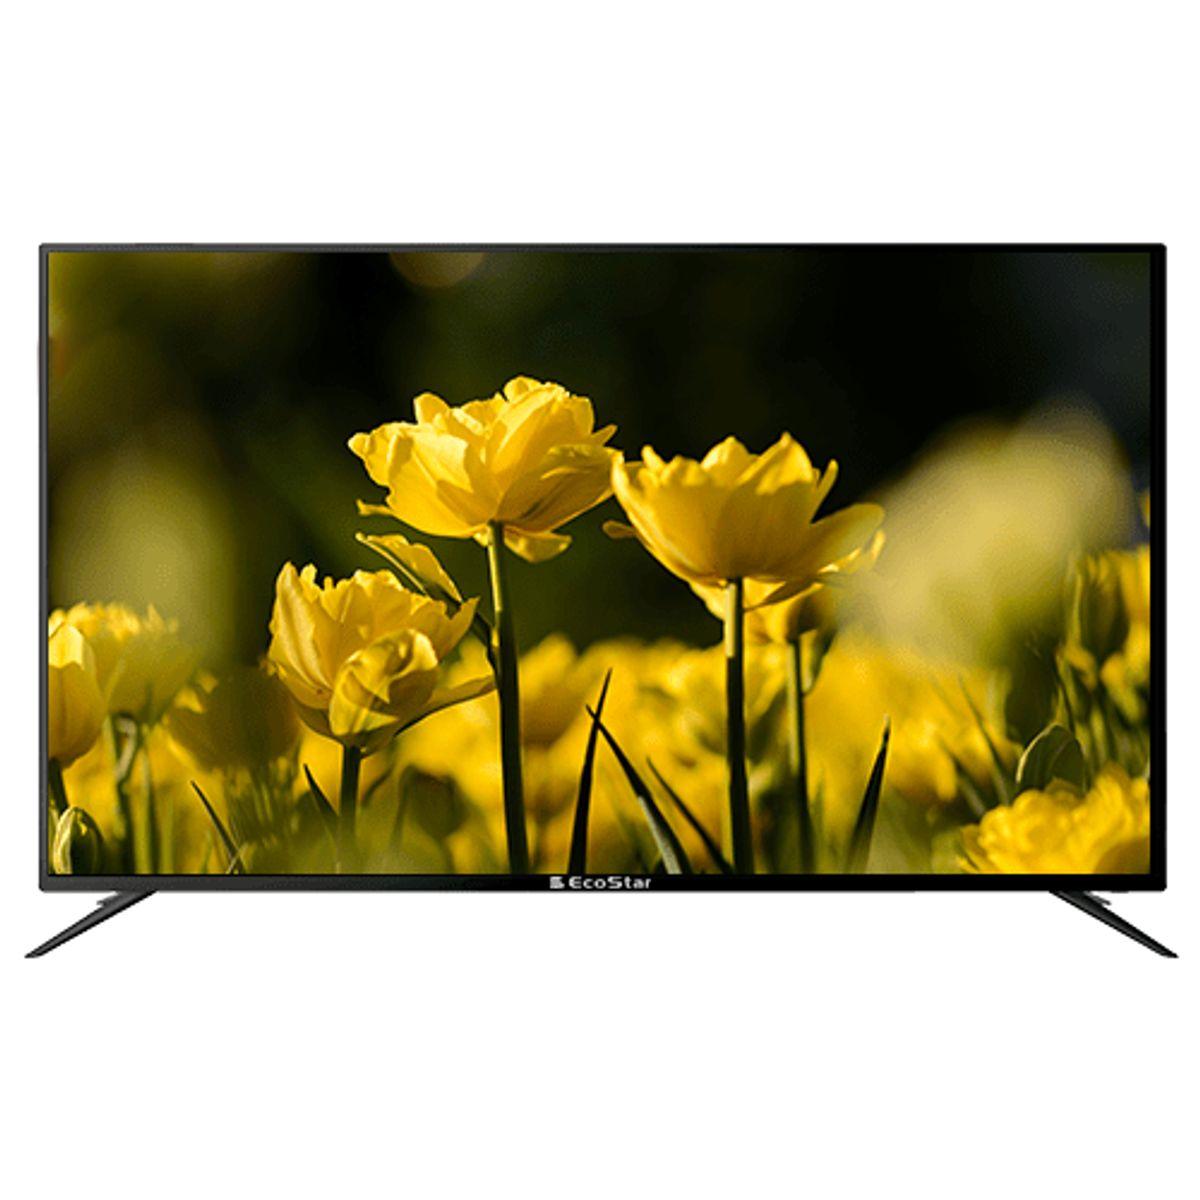 EcoStar 75 Inch HD Smart LED TV (75UD931)